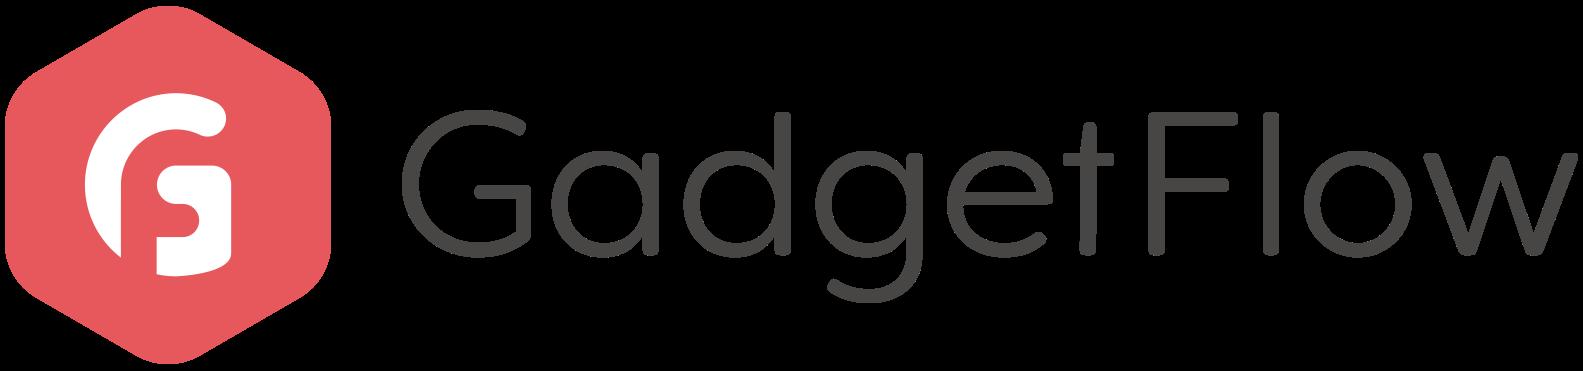 Gadget-Flow-Logo-Main